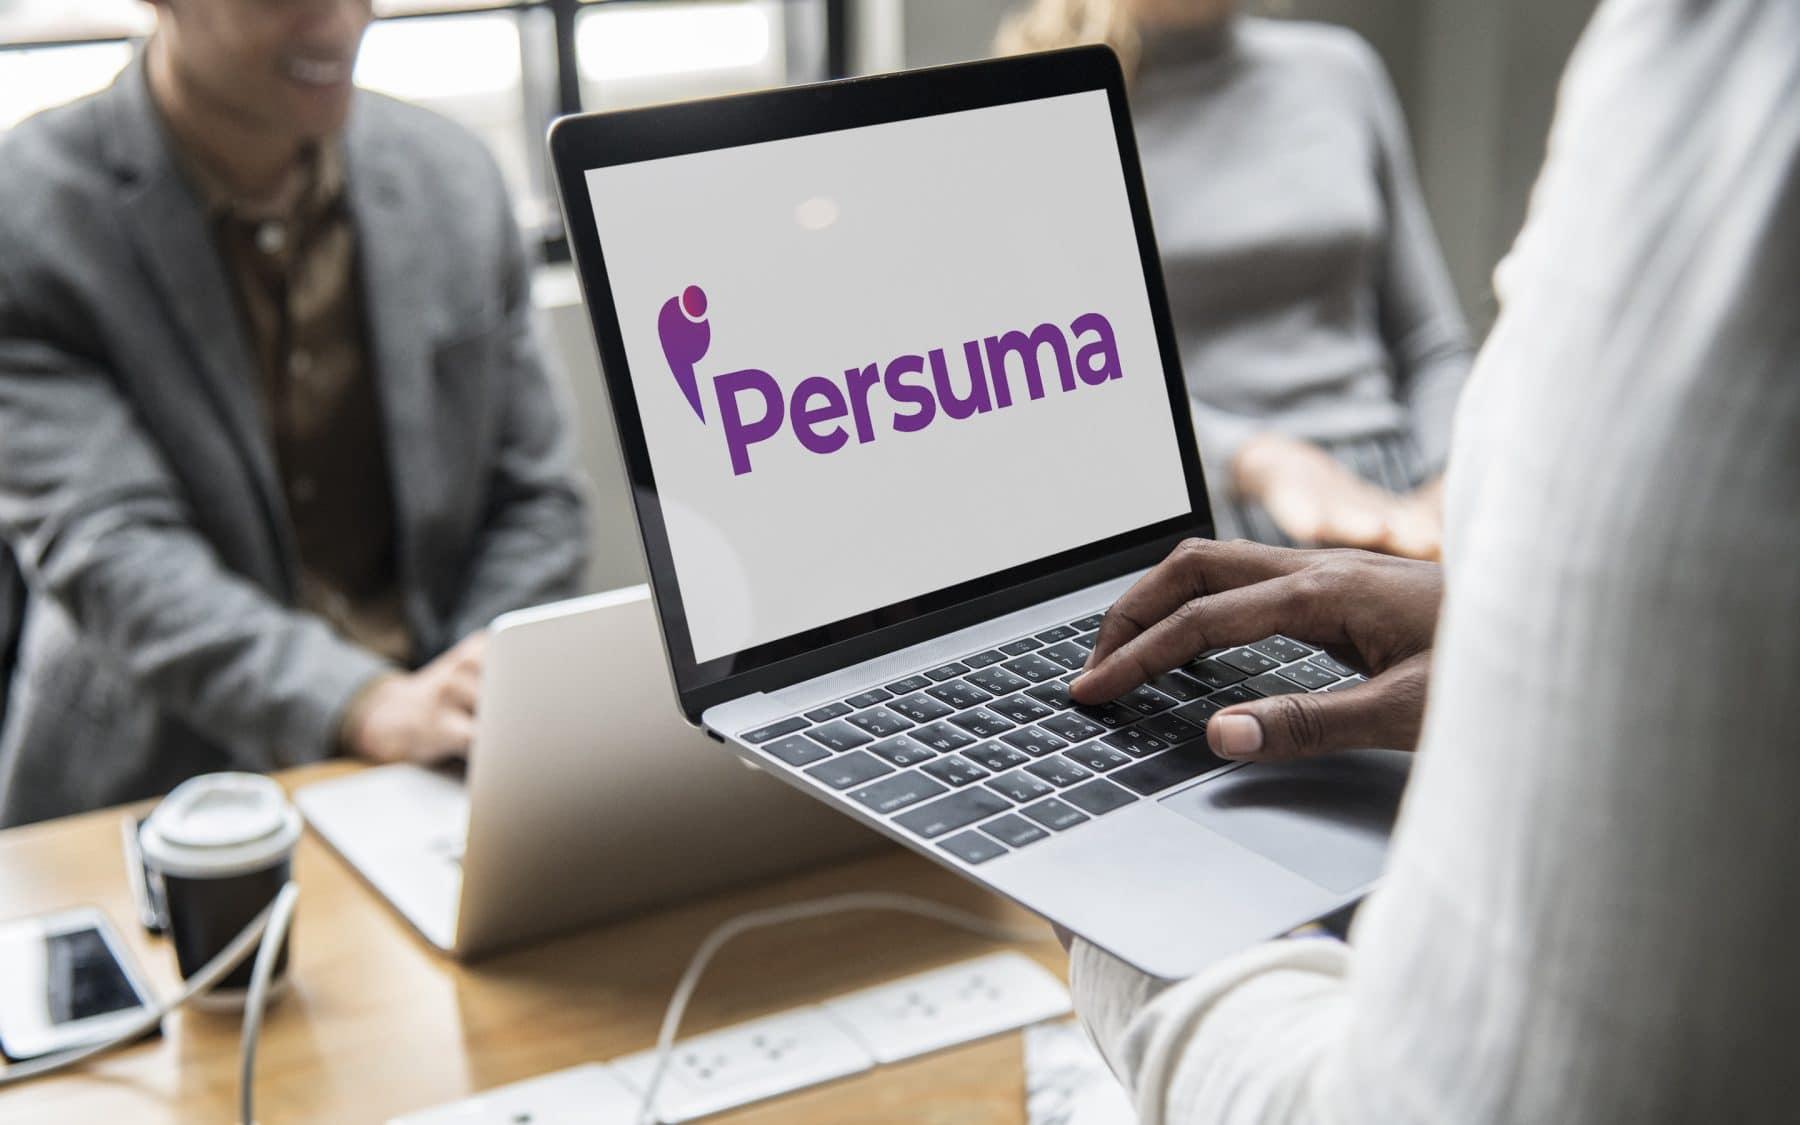 Persuma